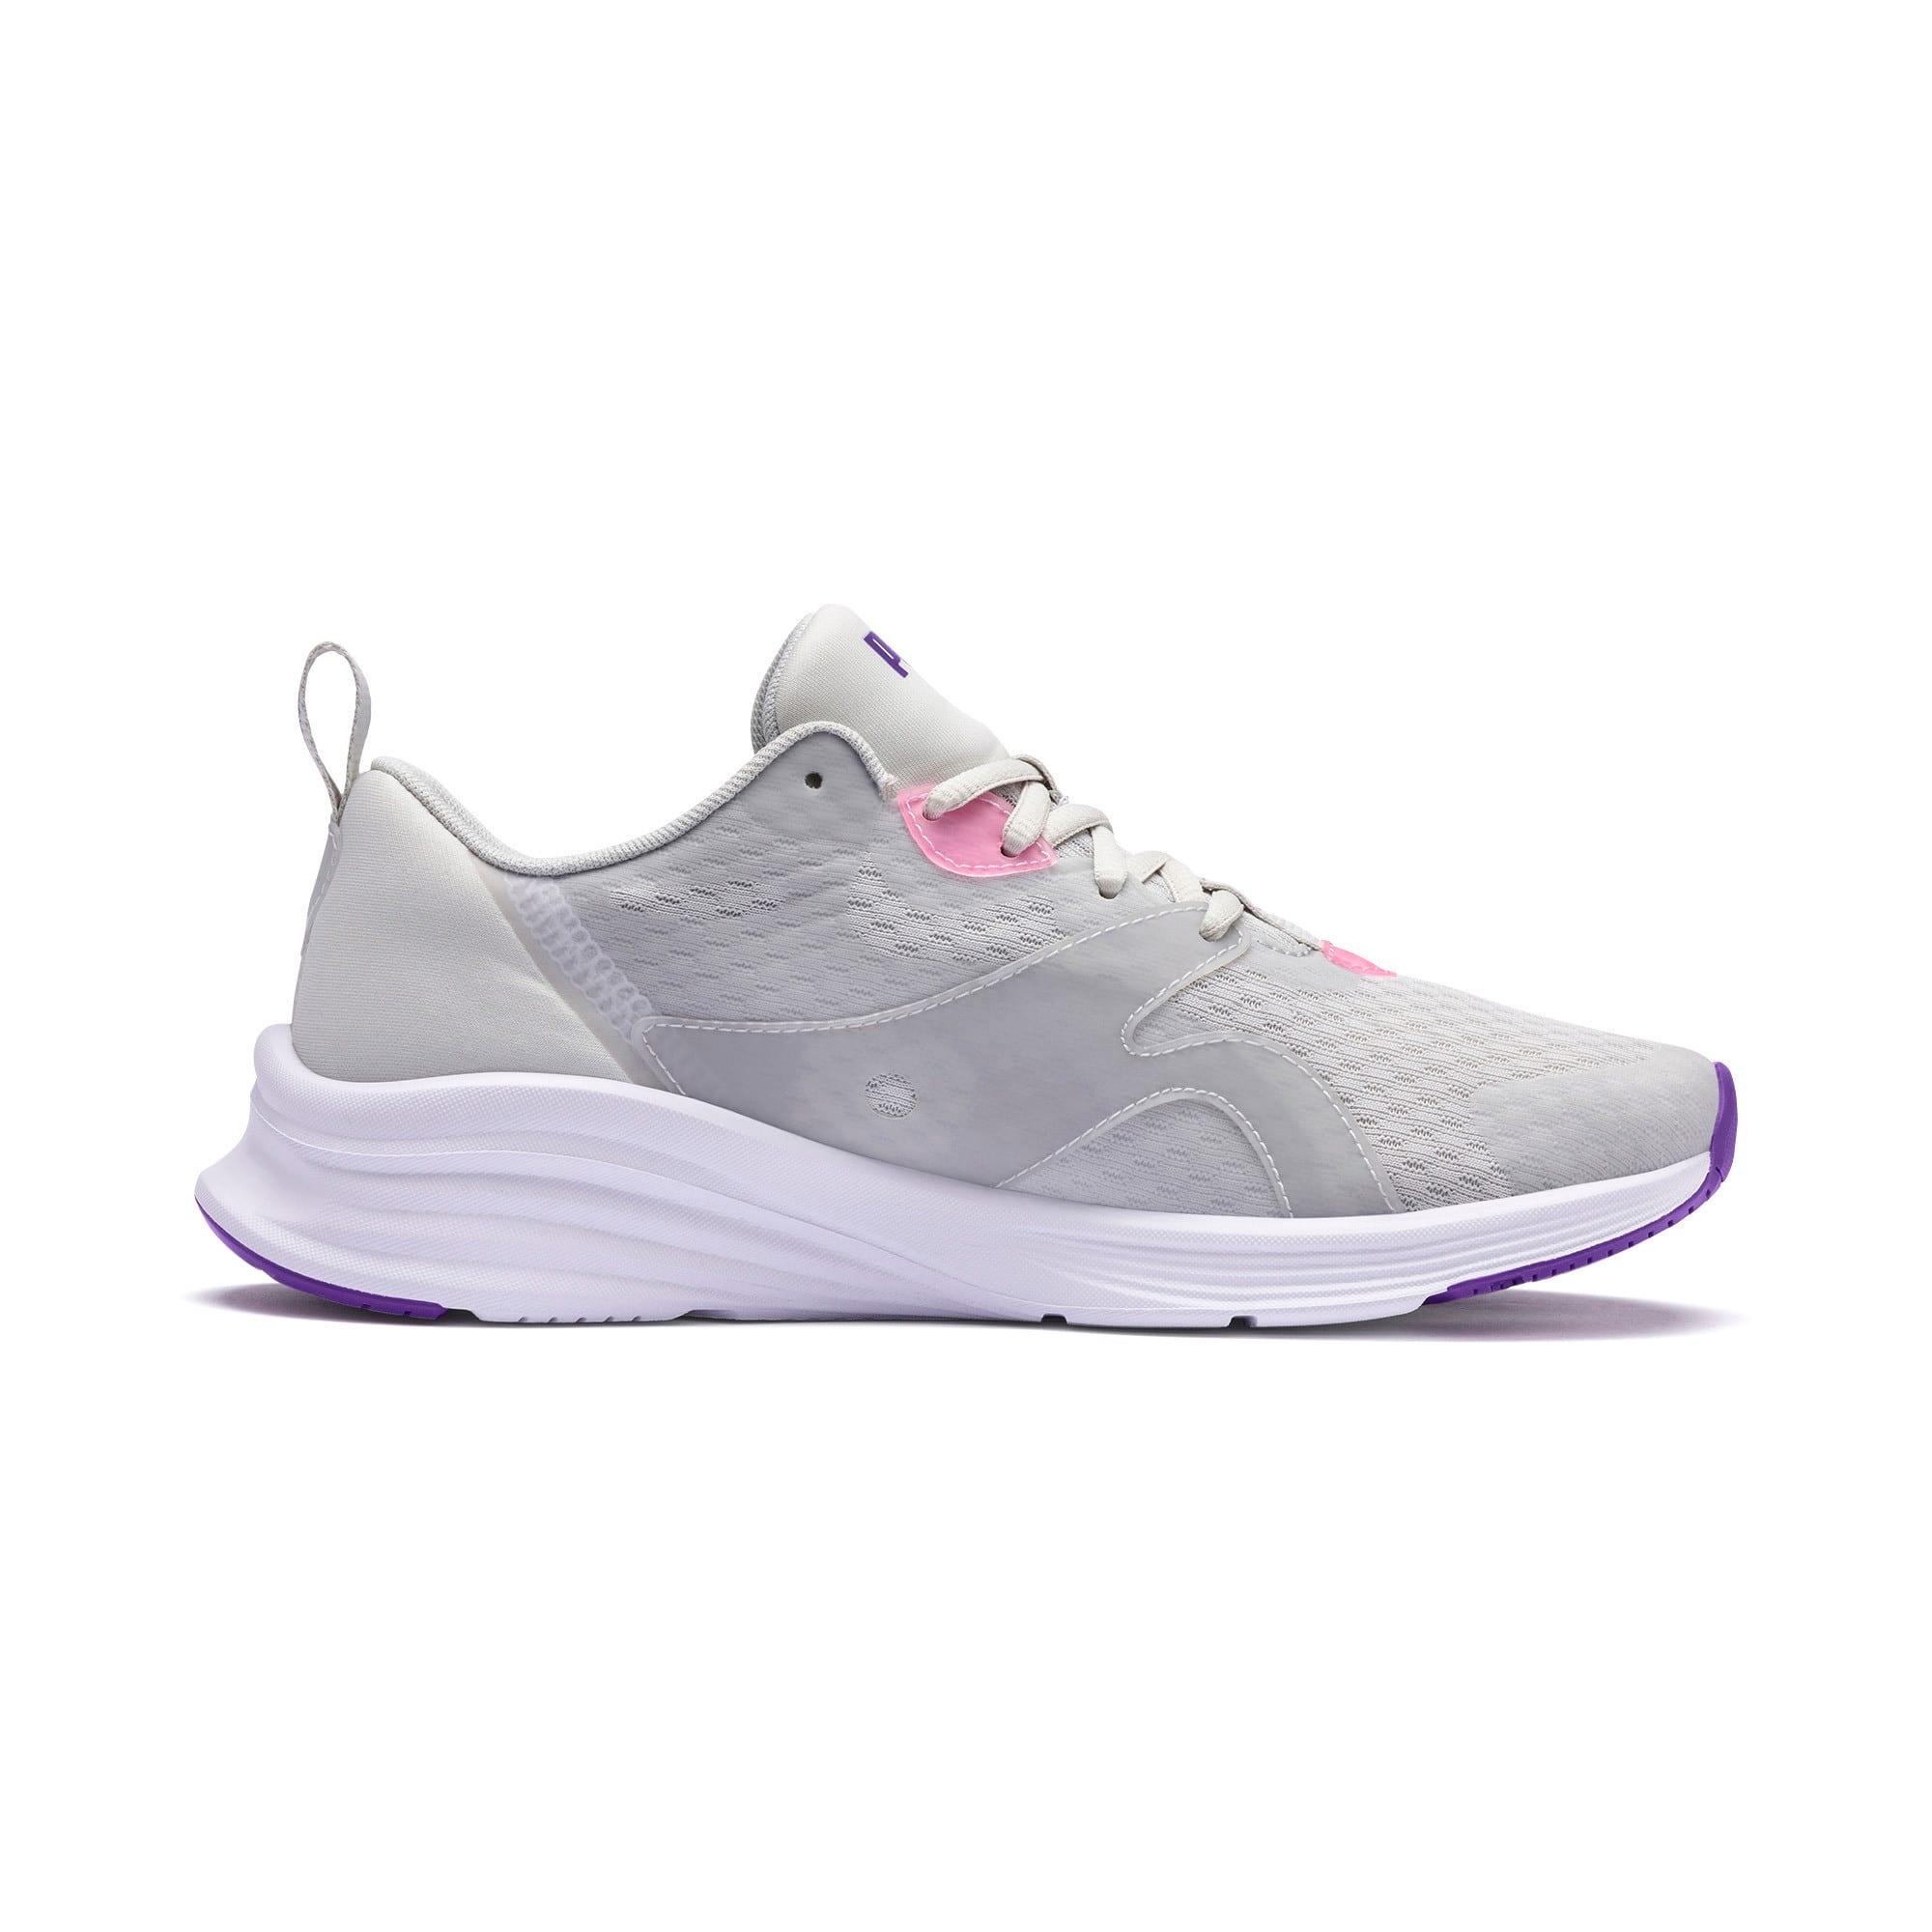 Thumbnail 5 of HYBRID Fuego Women's Running Shoes, Glacier Gray-Purple Glimmer, medium